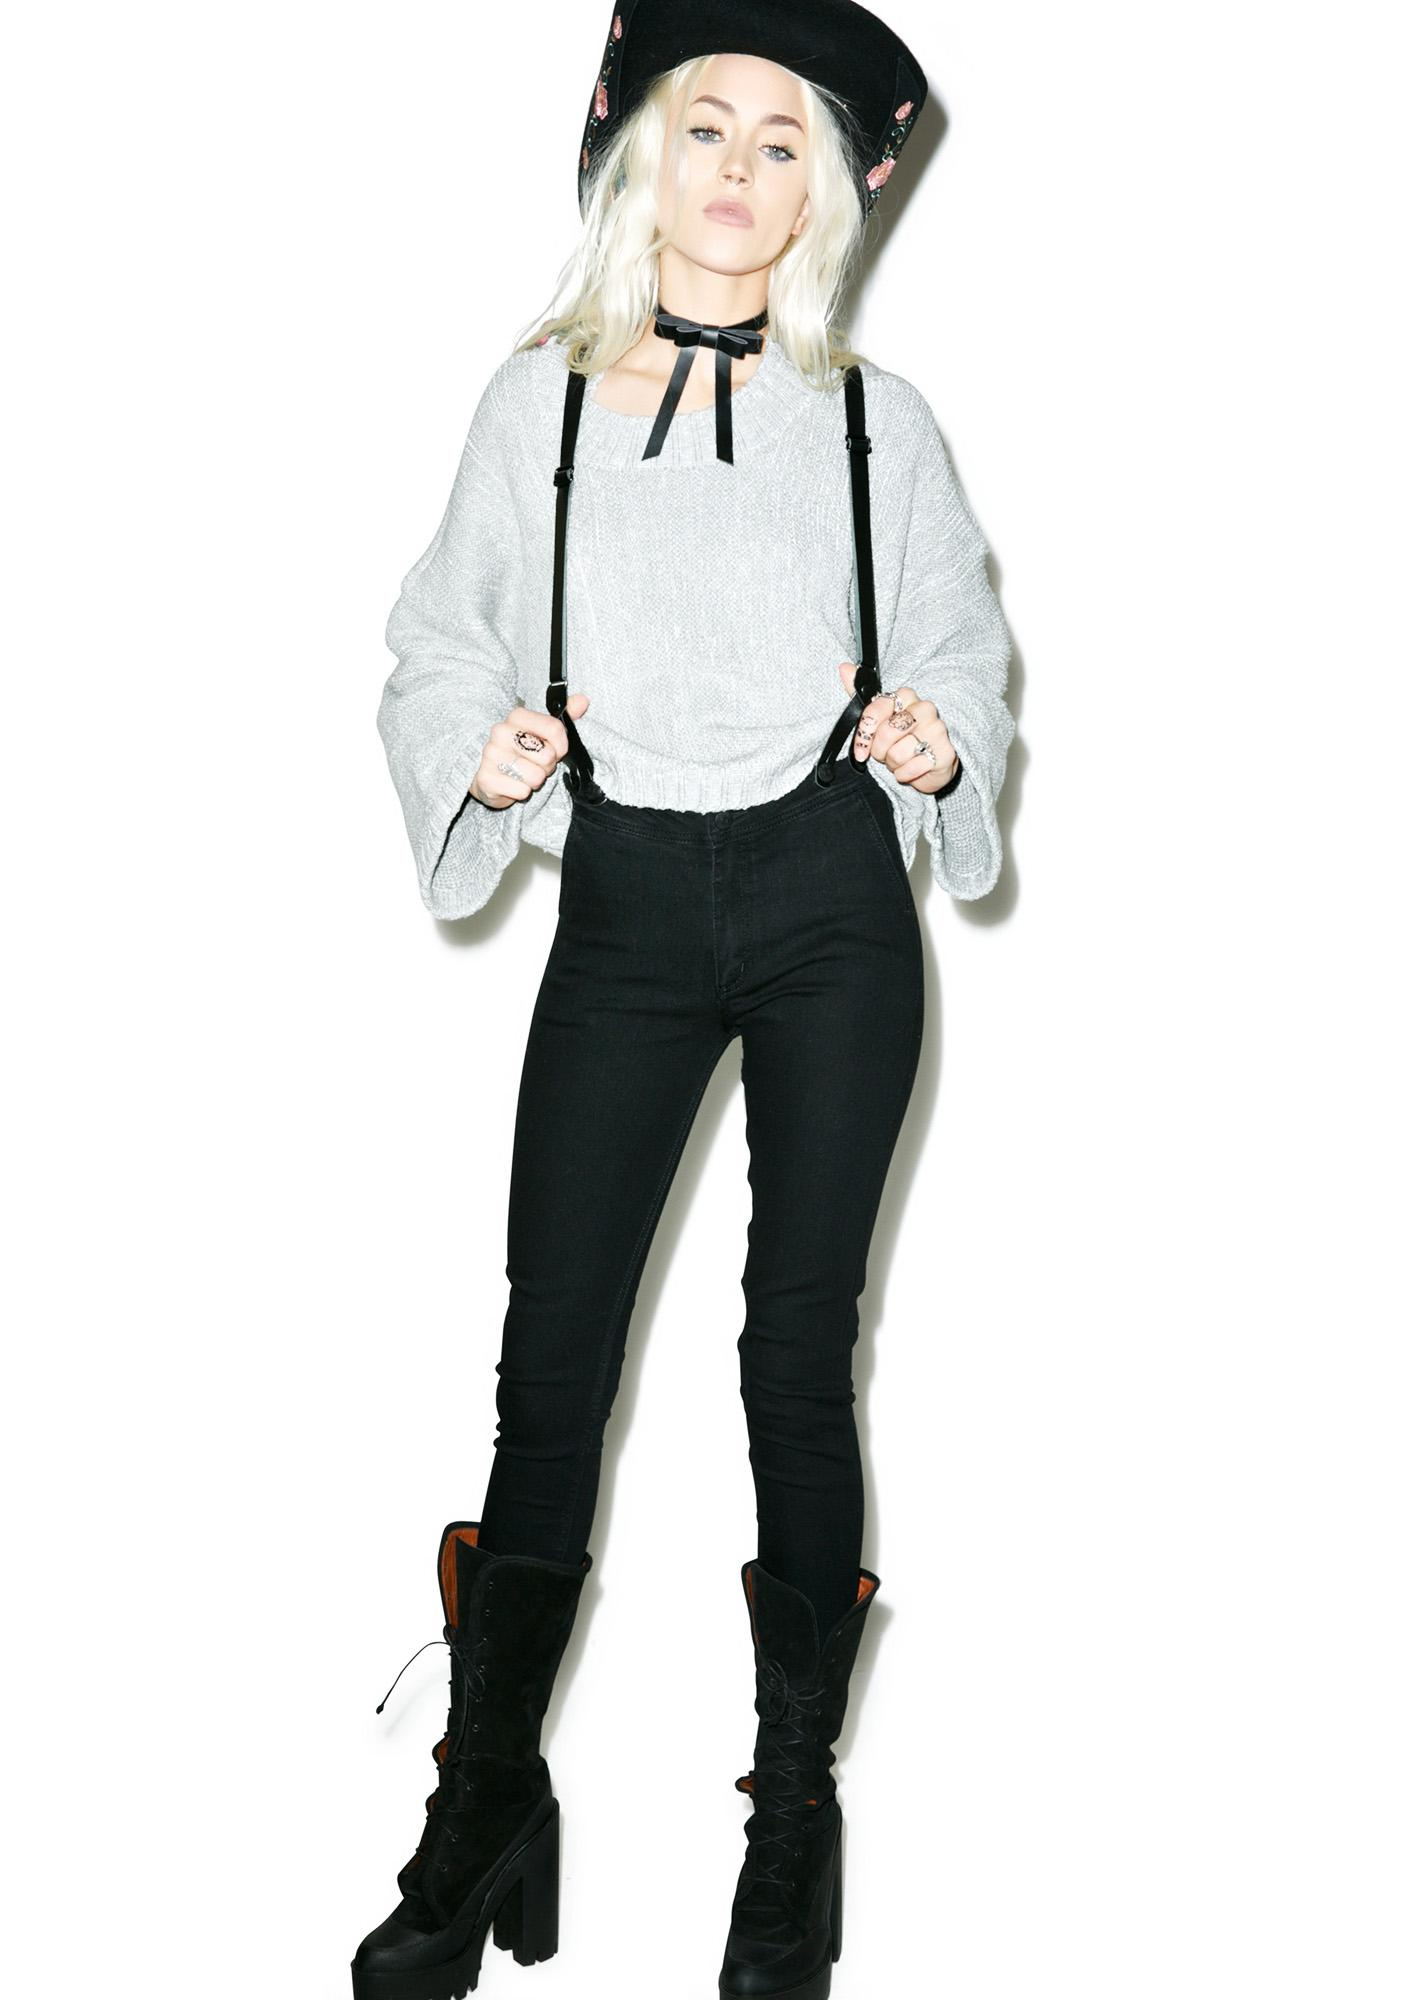 Courtshop James Skinny Jeans With Suspenders